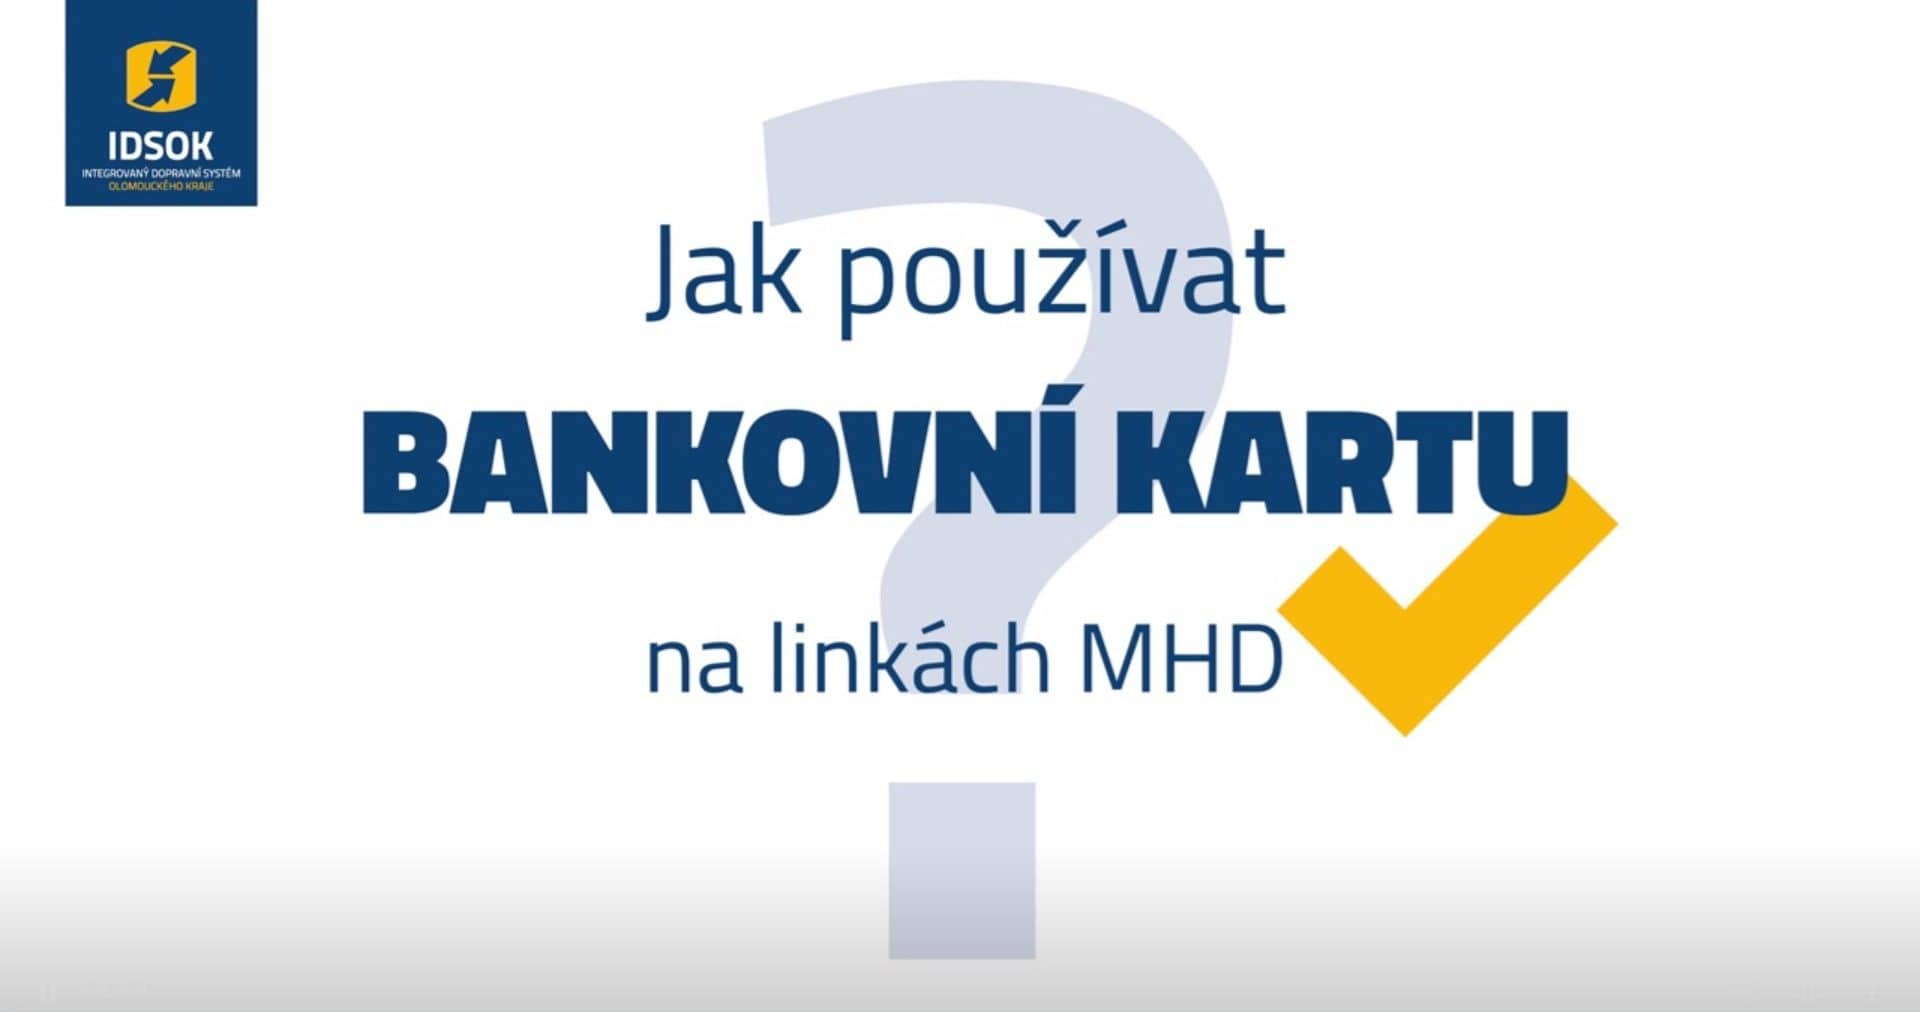 Jak-pouzivat-bankovni-kartu-MHD